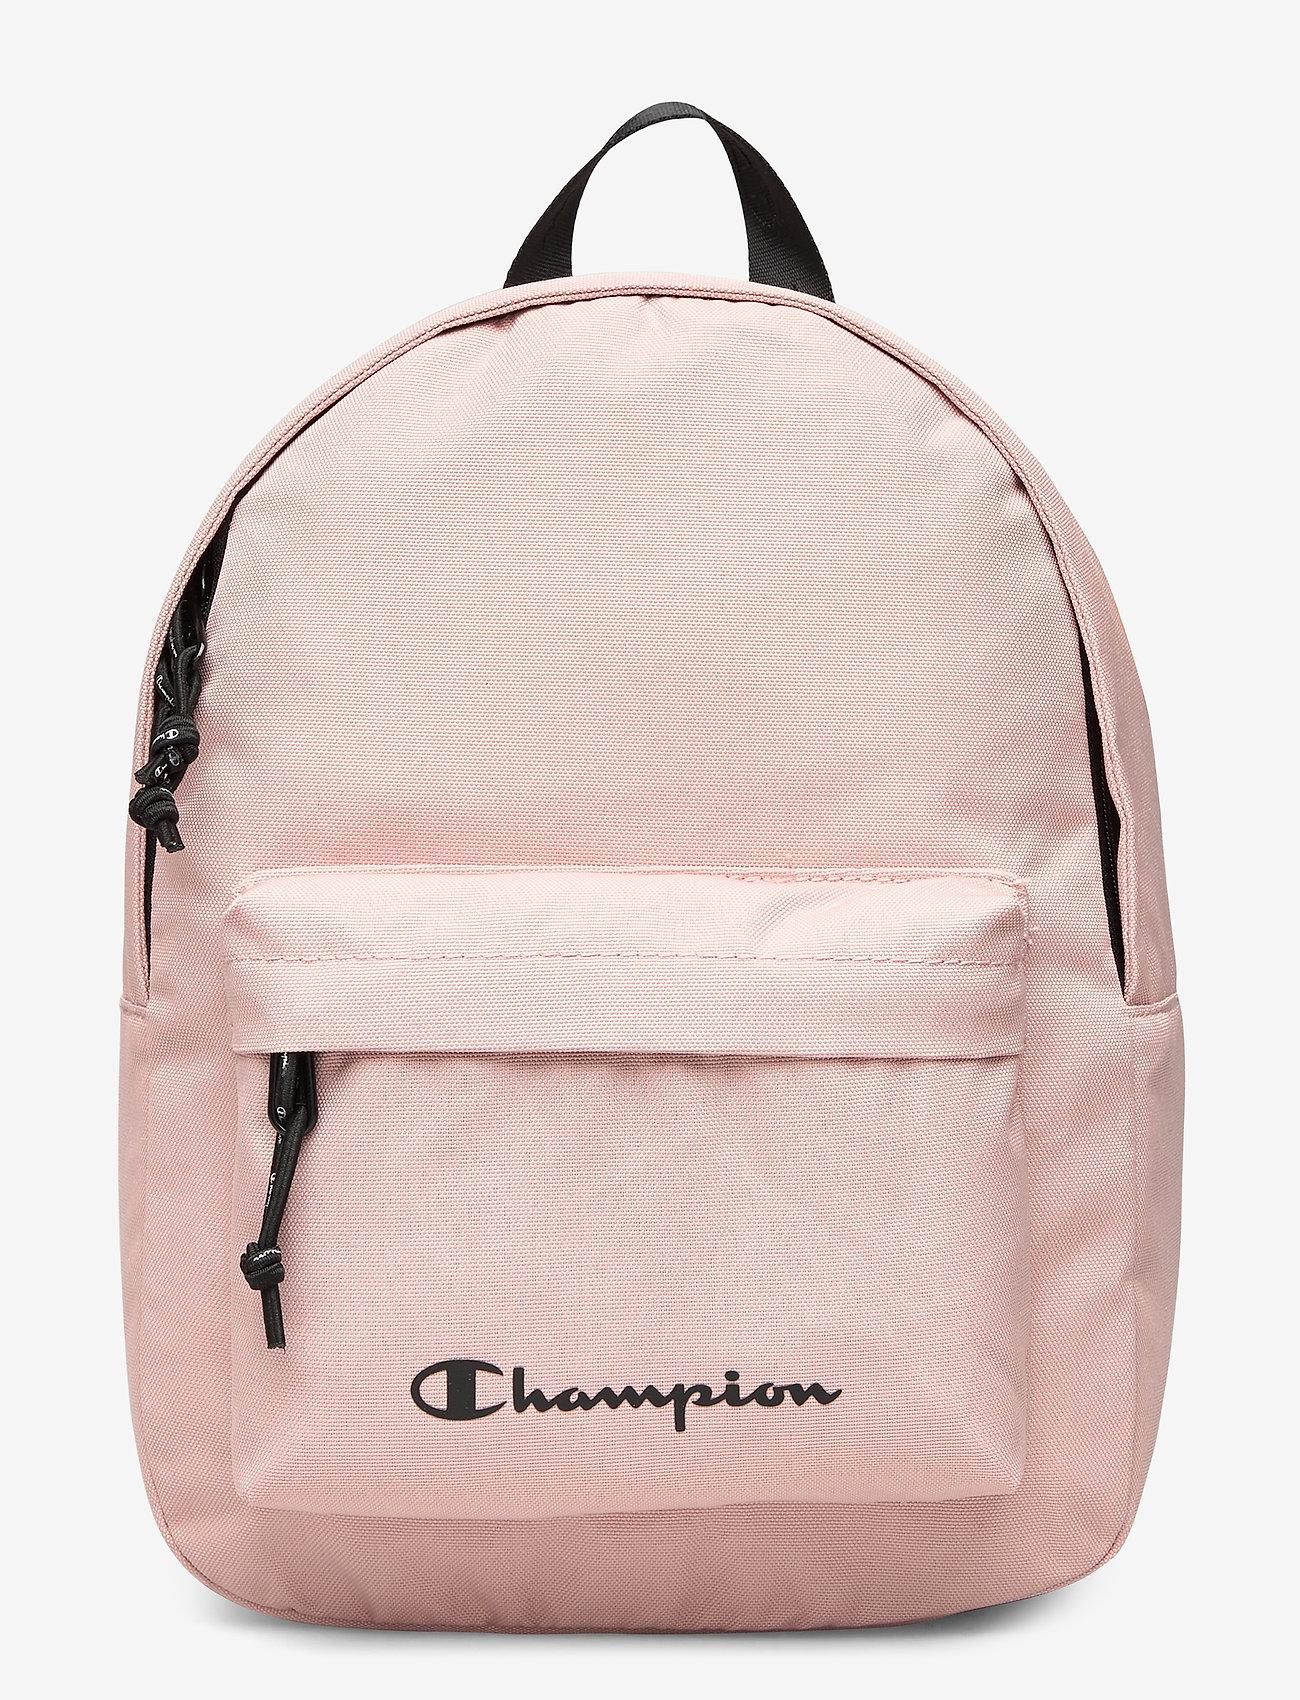 Champion - Small Backpack - treenikassit - misty rose - 0